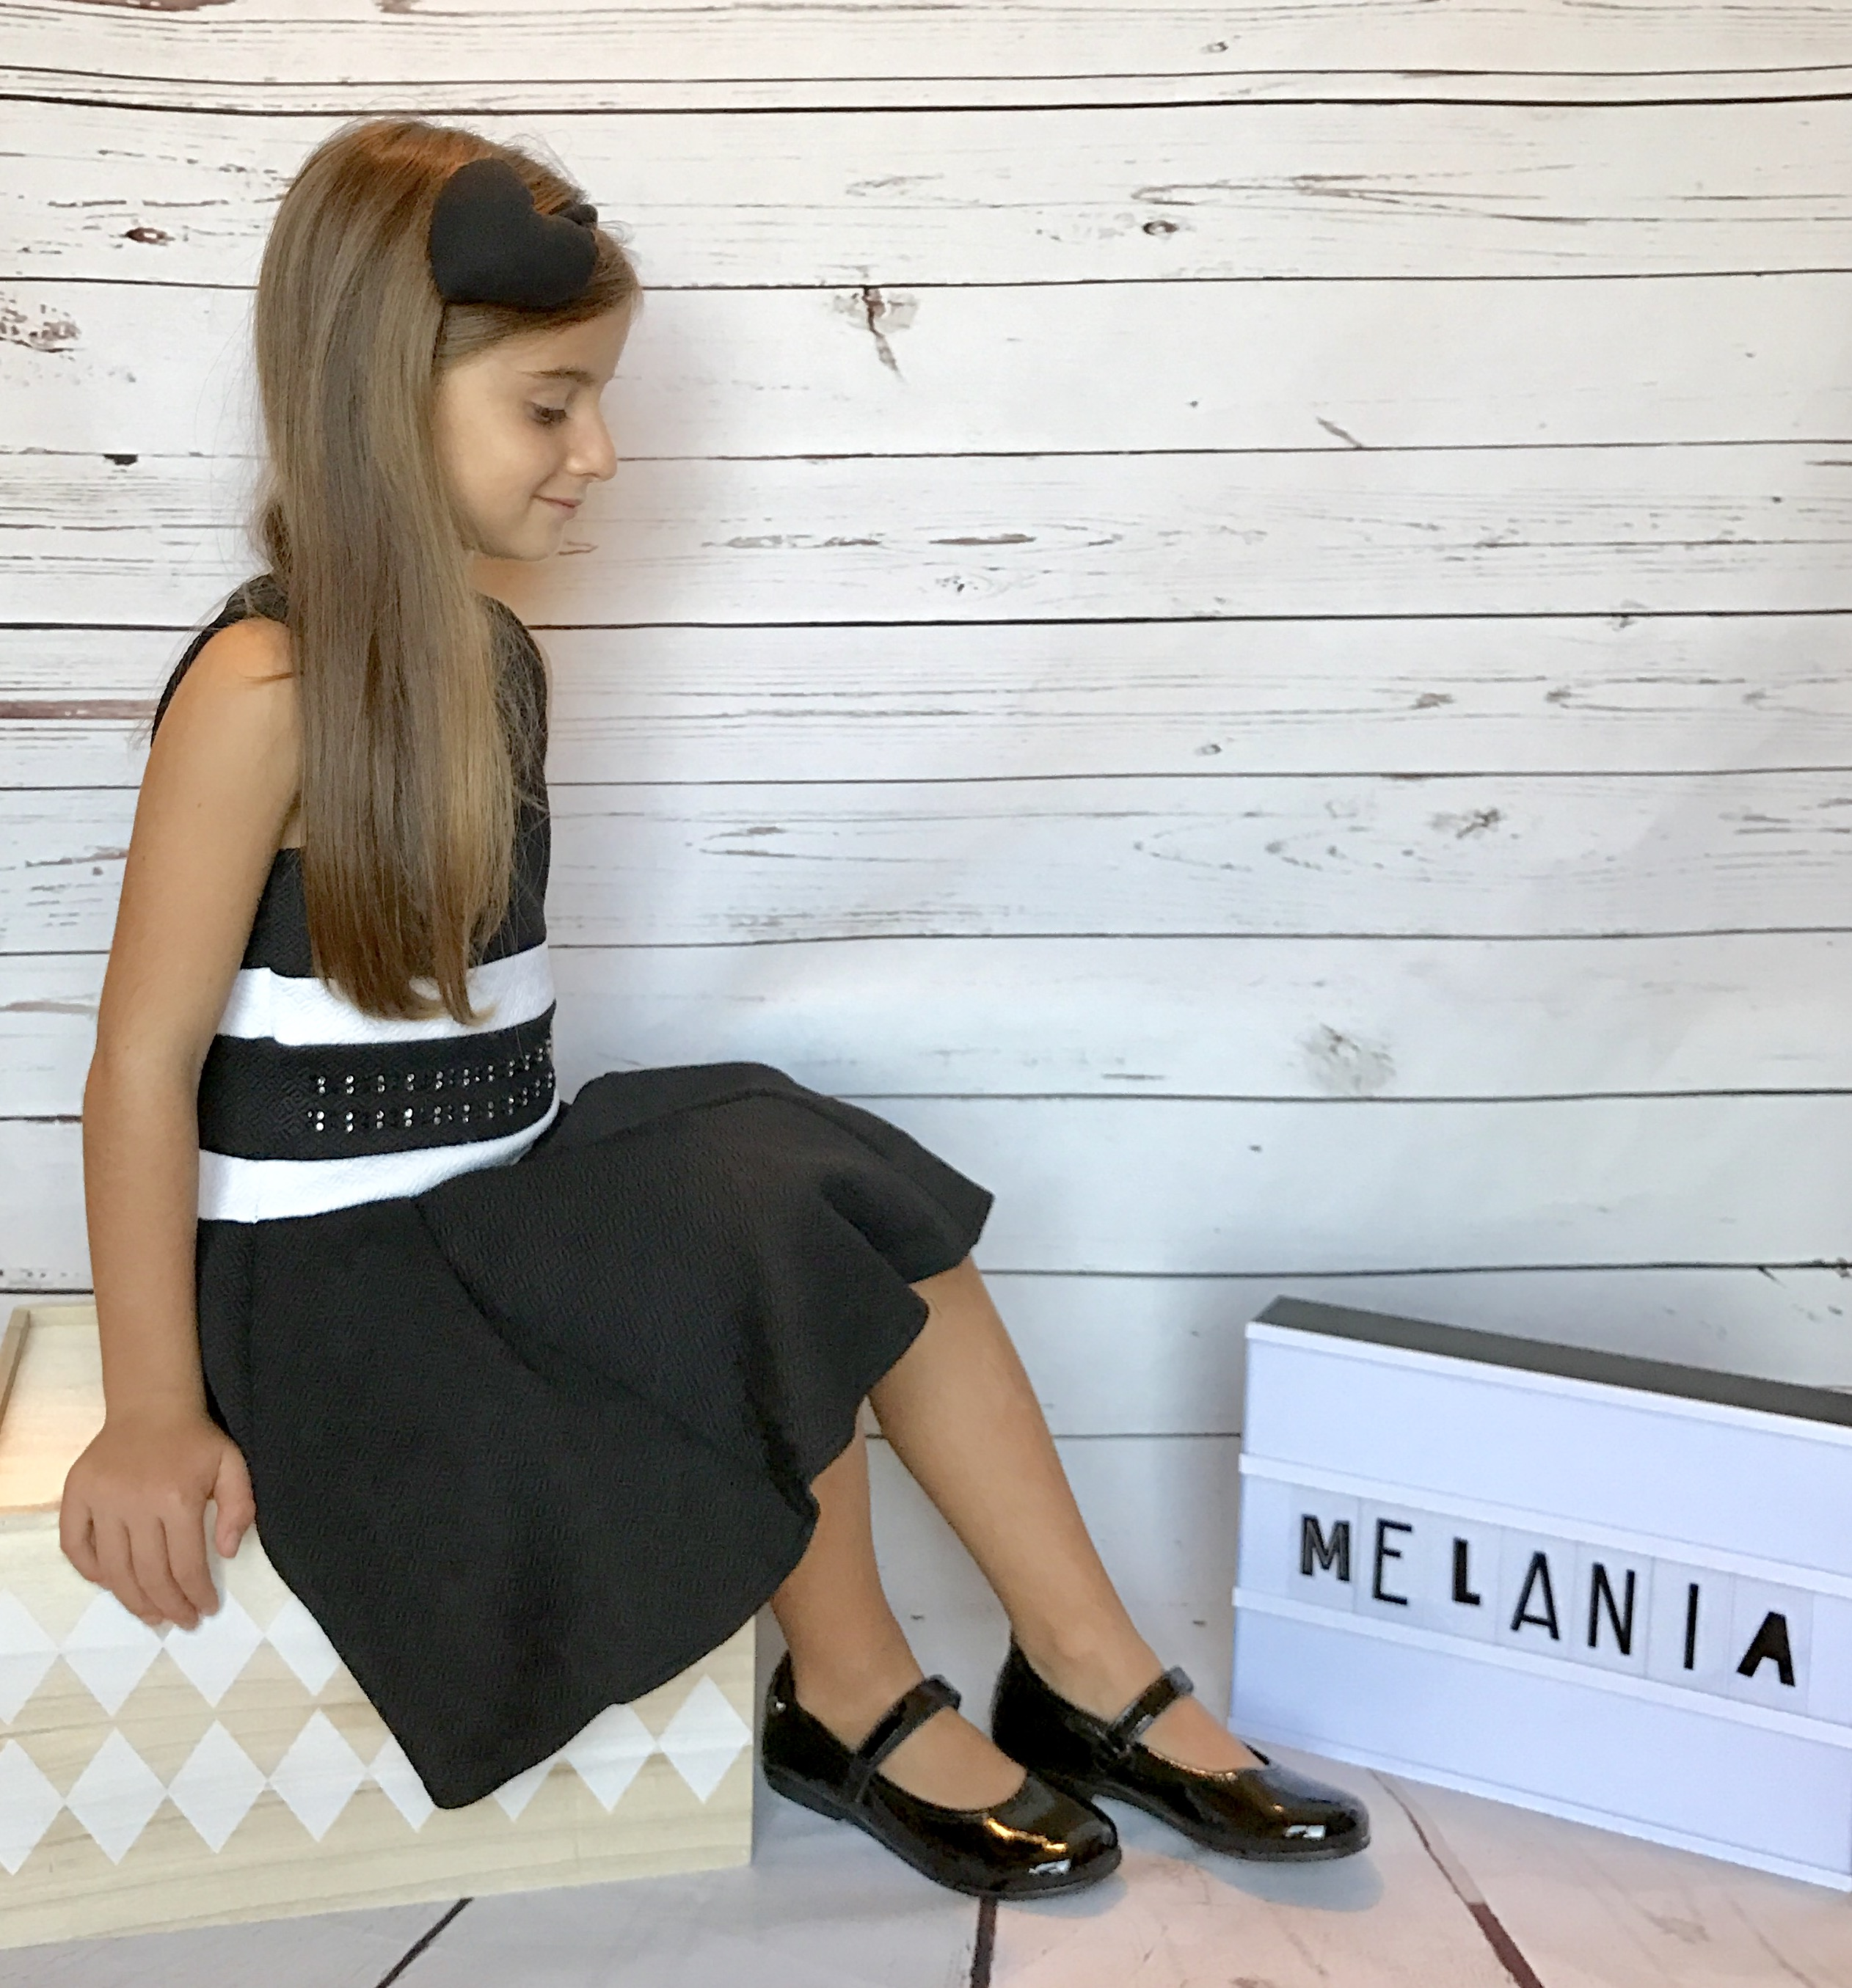 Scarpe Melania per bambini trendy ed eleganti - MammaLifeStyle a27445b779b